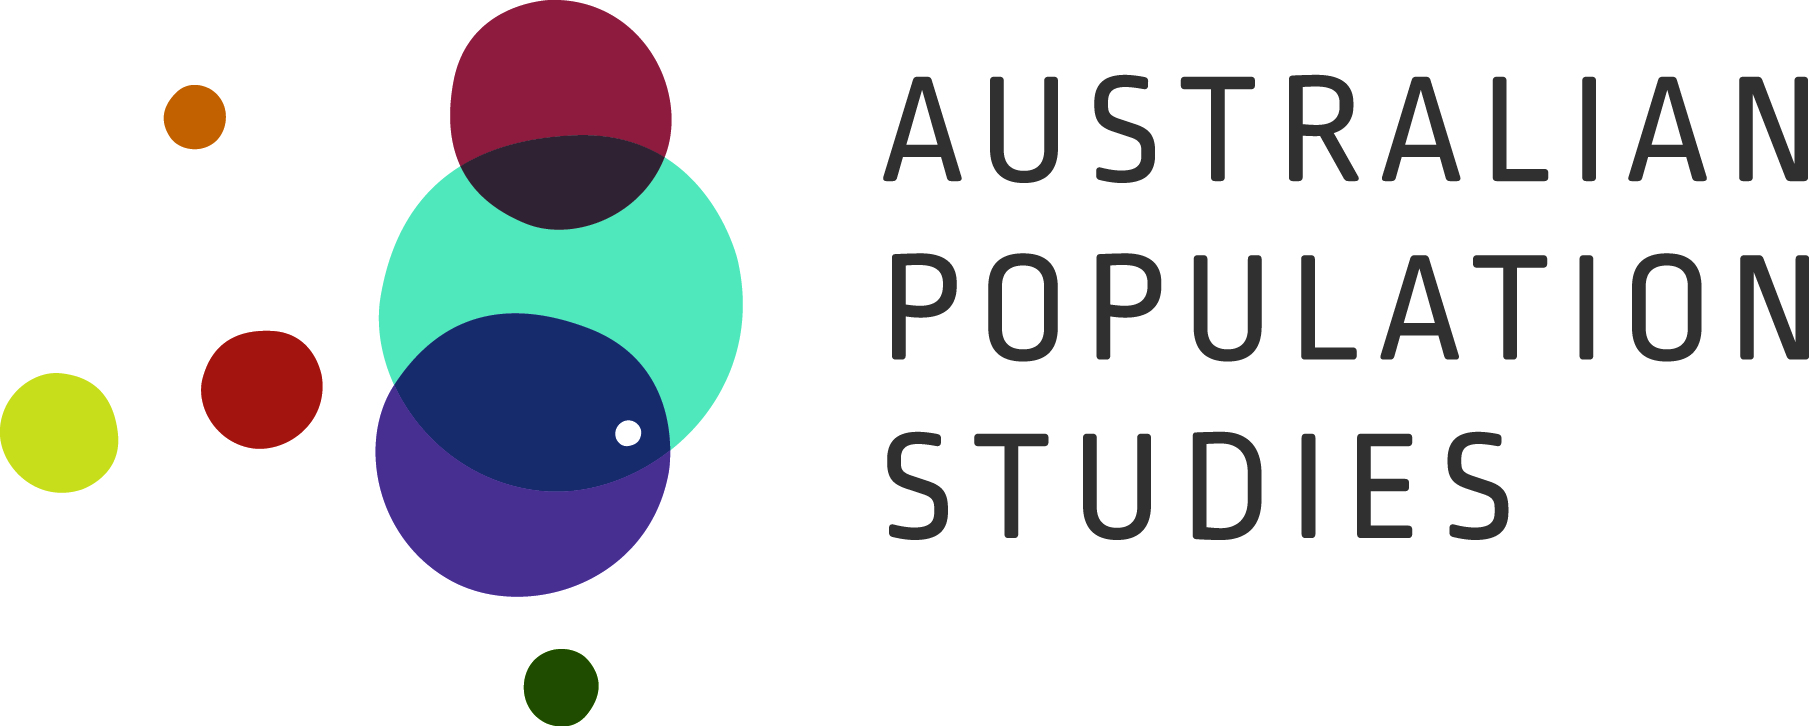 Australian Population Studies logo